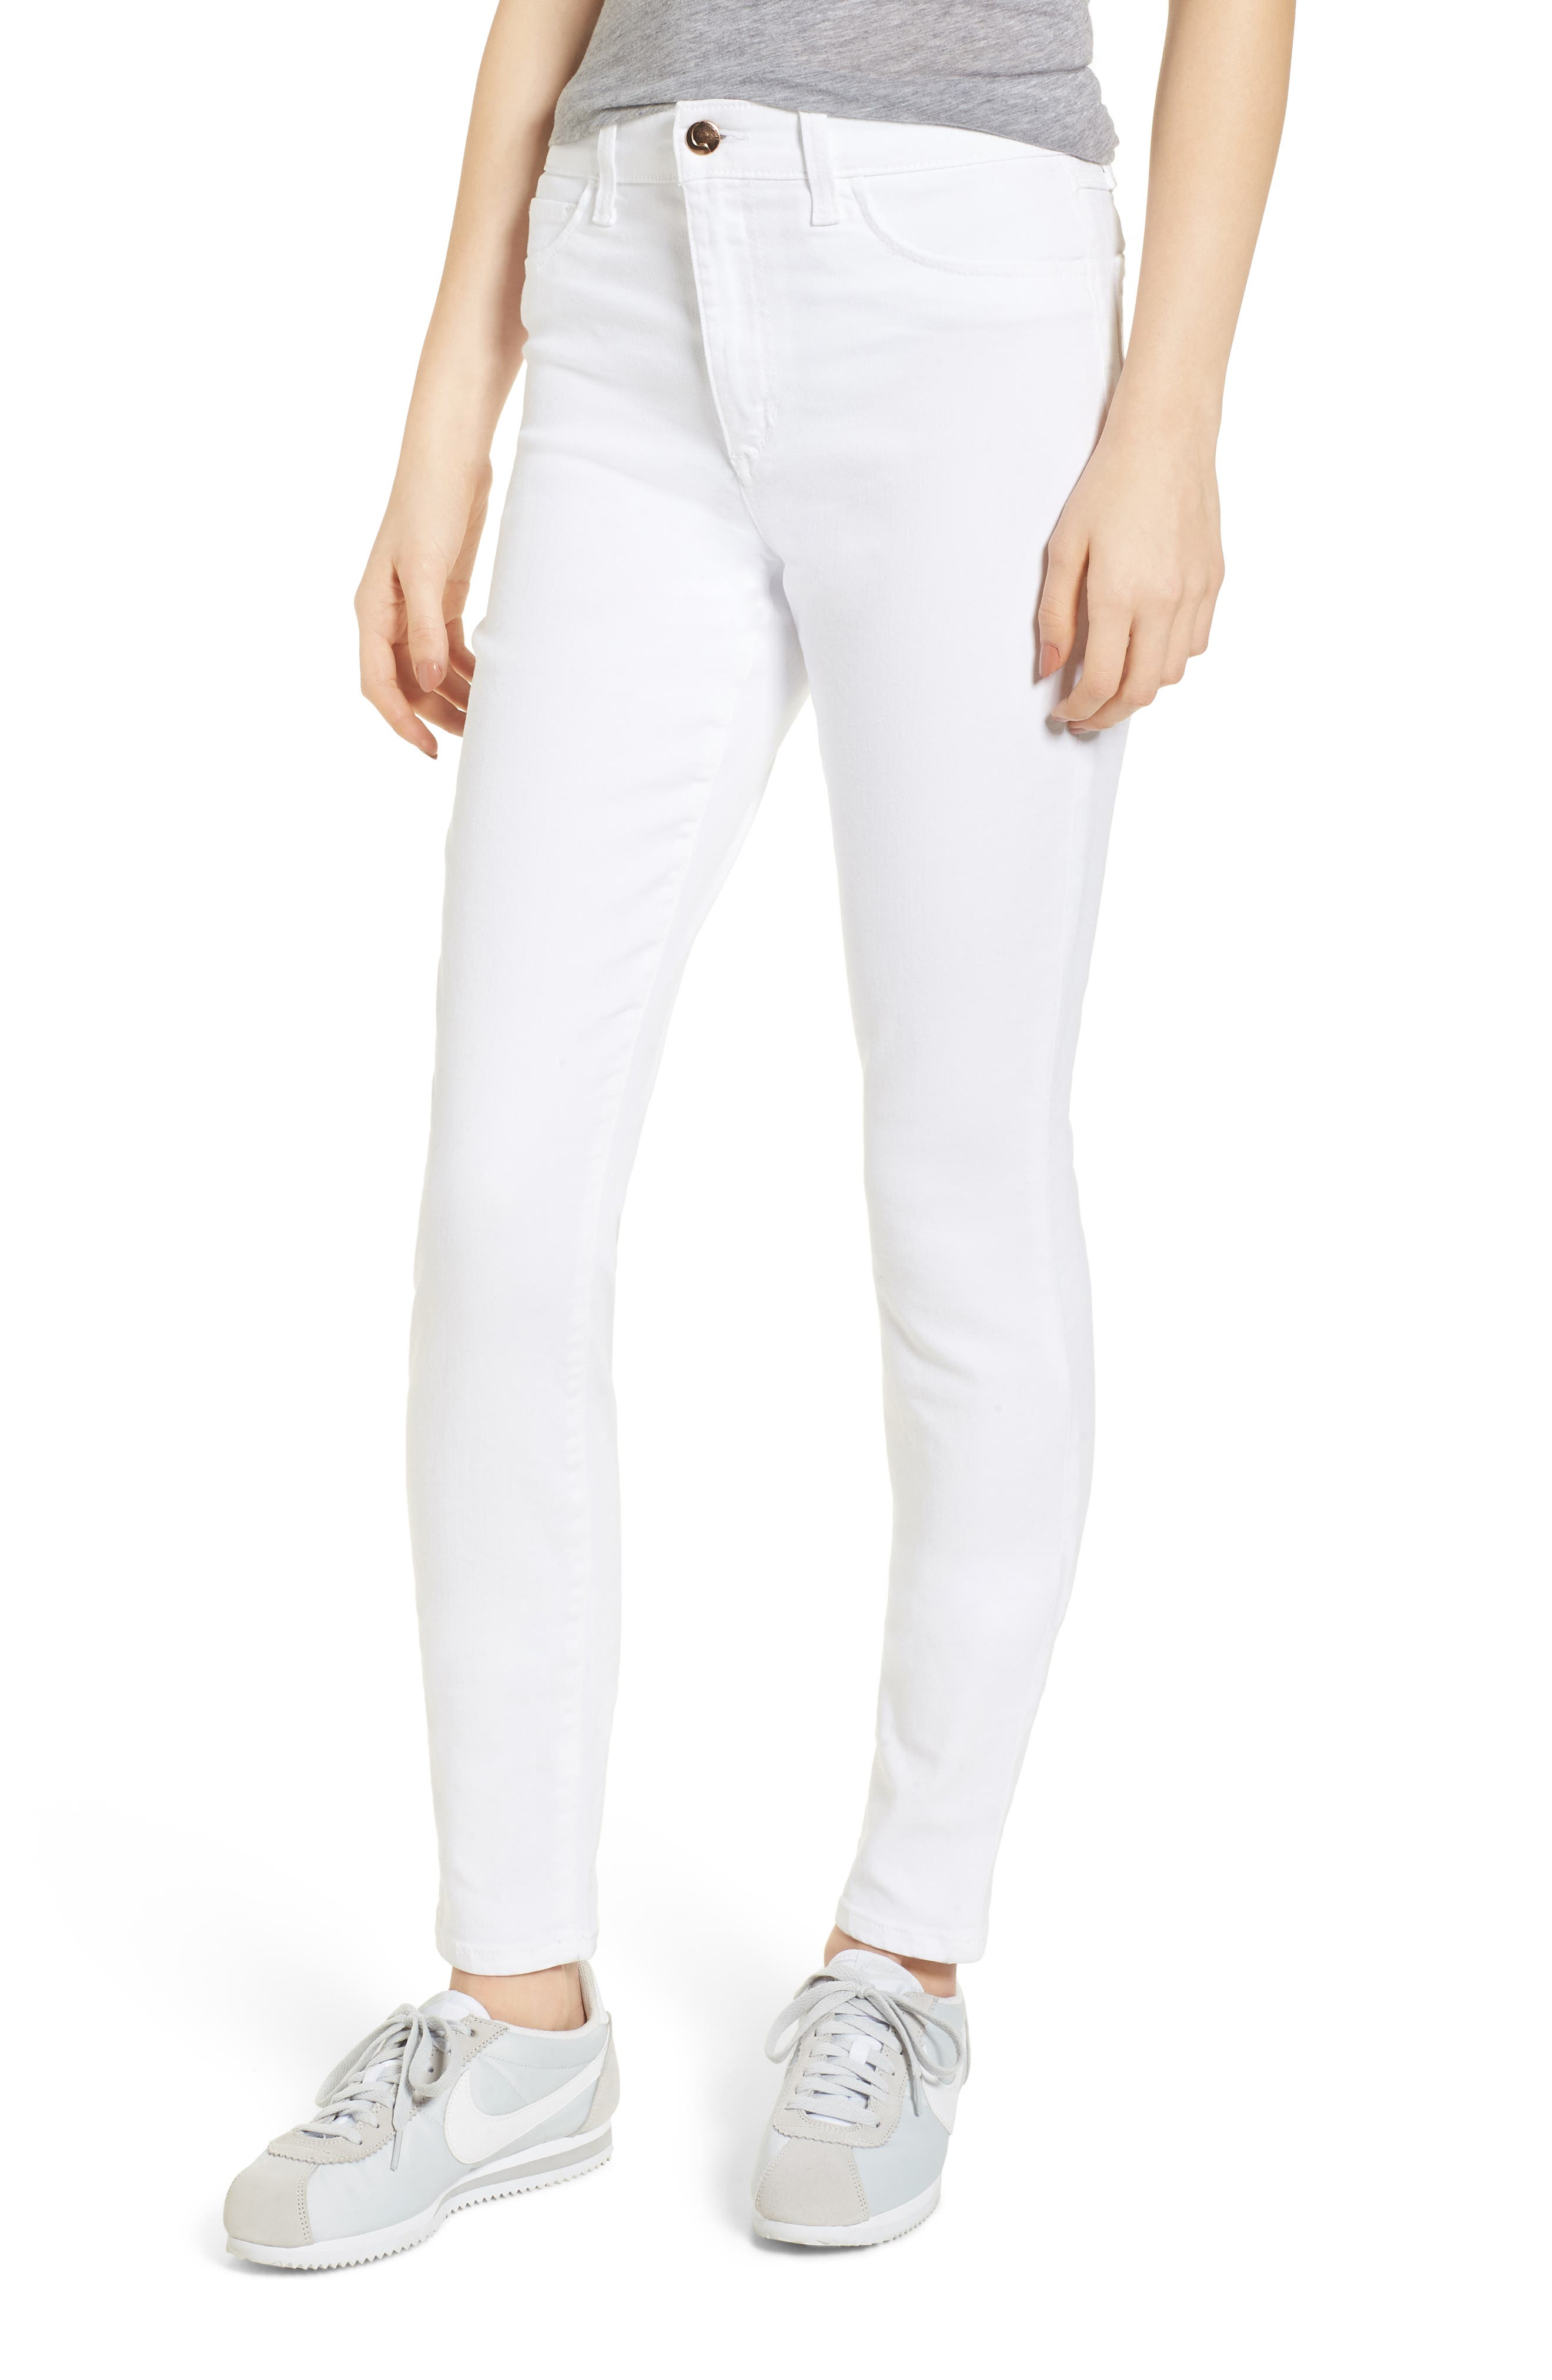 Charlie Skinny Jeans,                             Main thumbnail 1, color,                             HENNIE